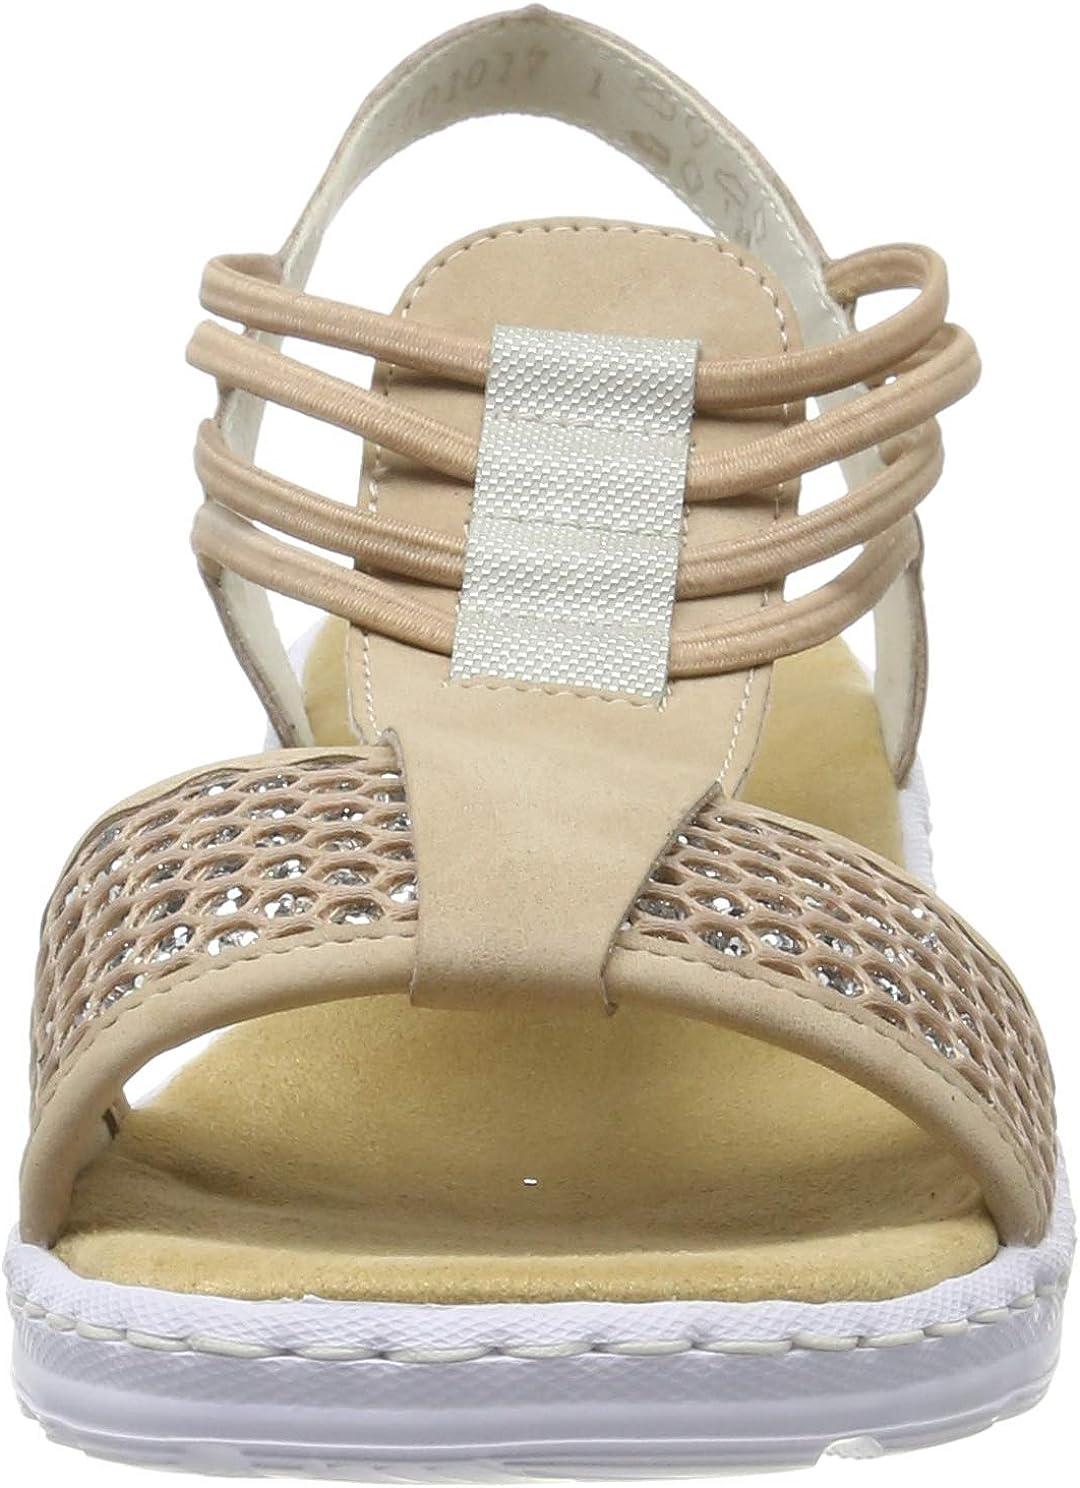 Rieker Damen Sandale rosa V18L6 31